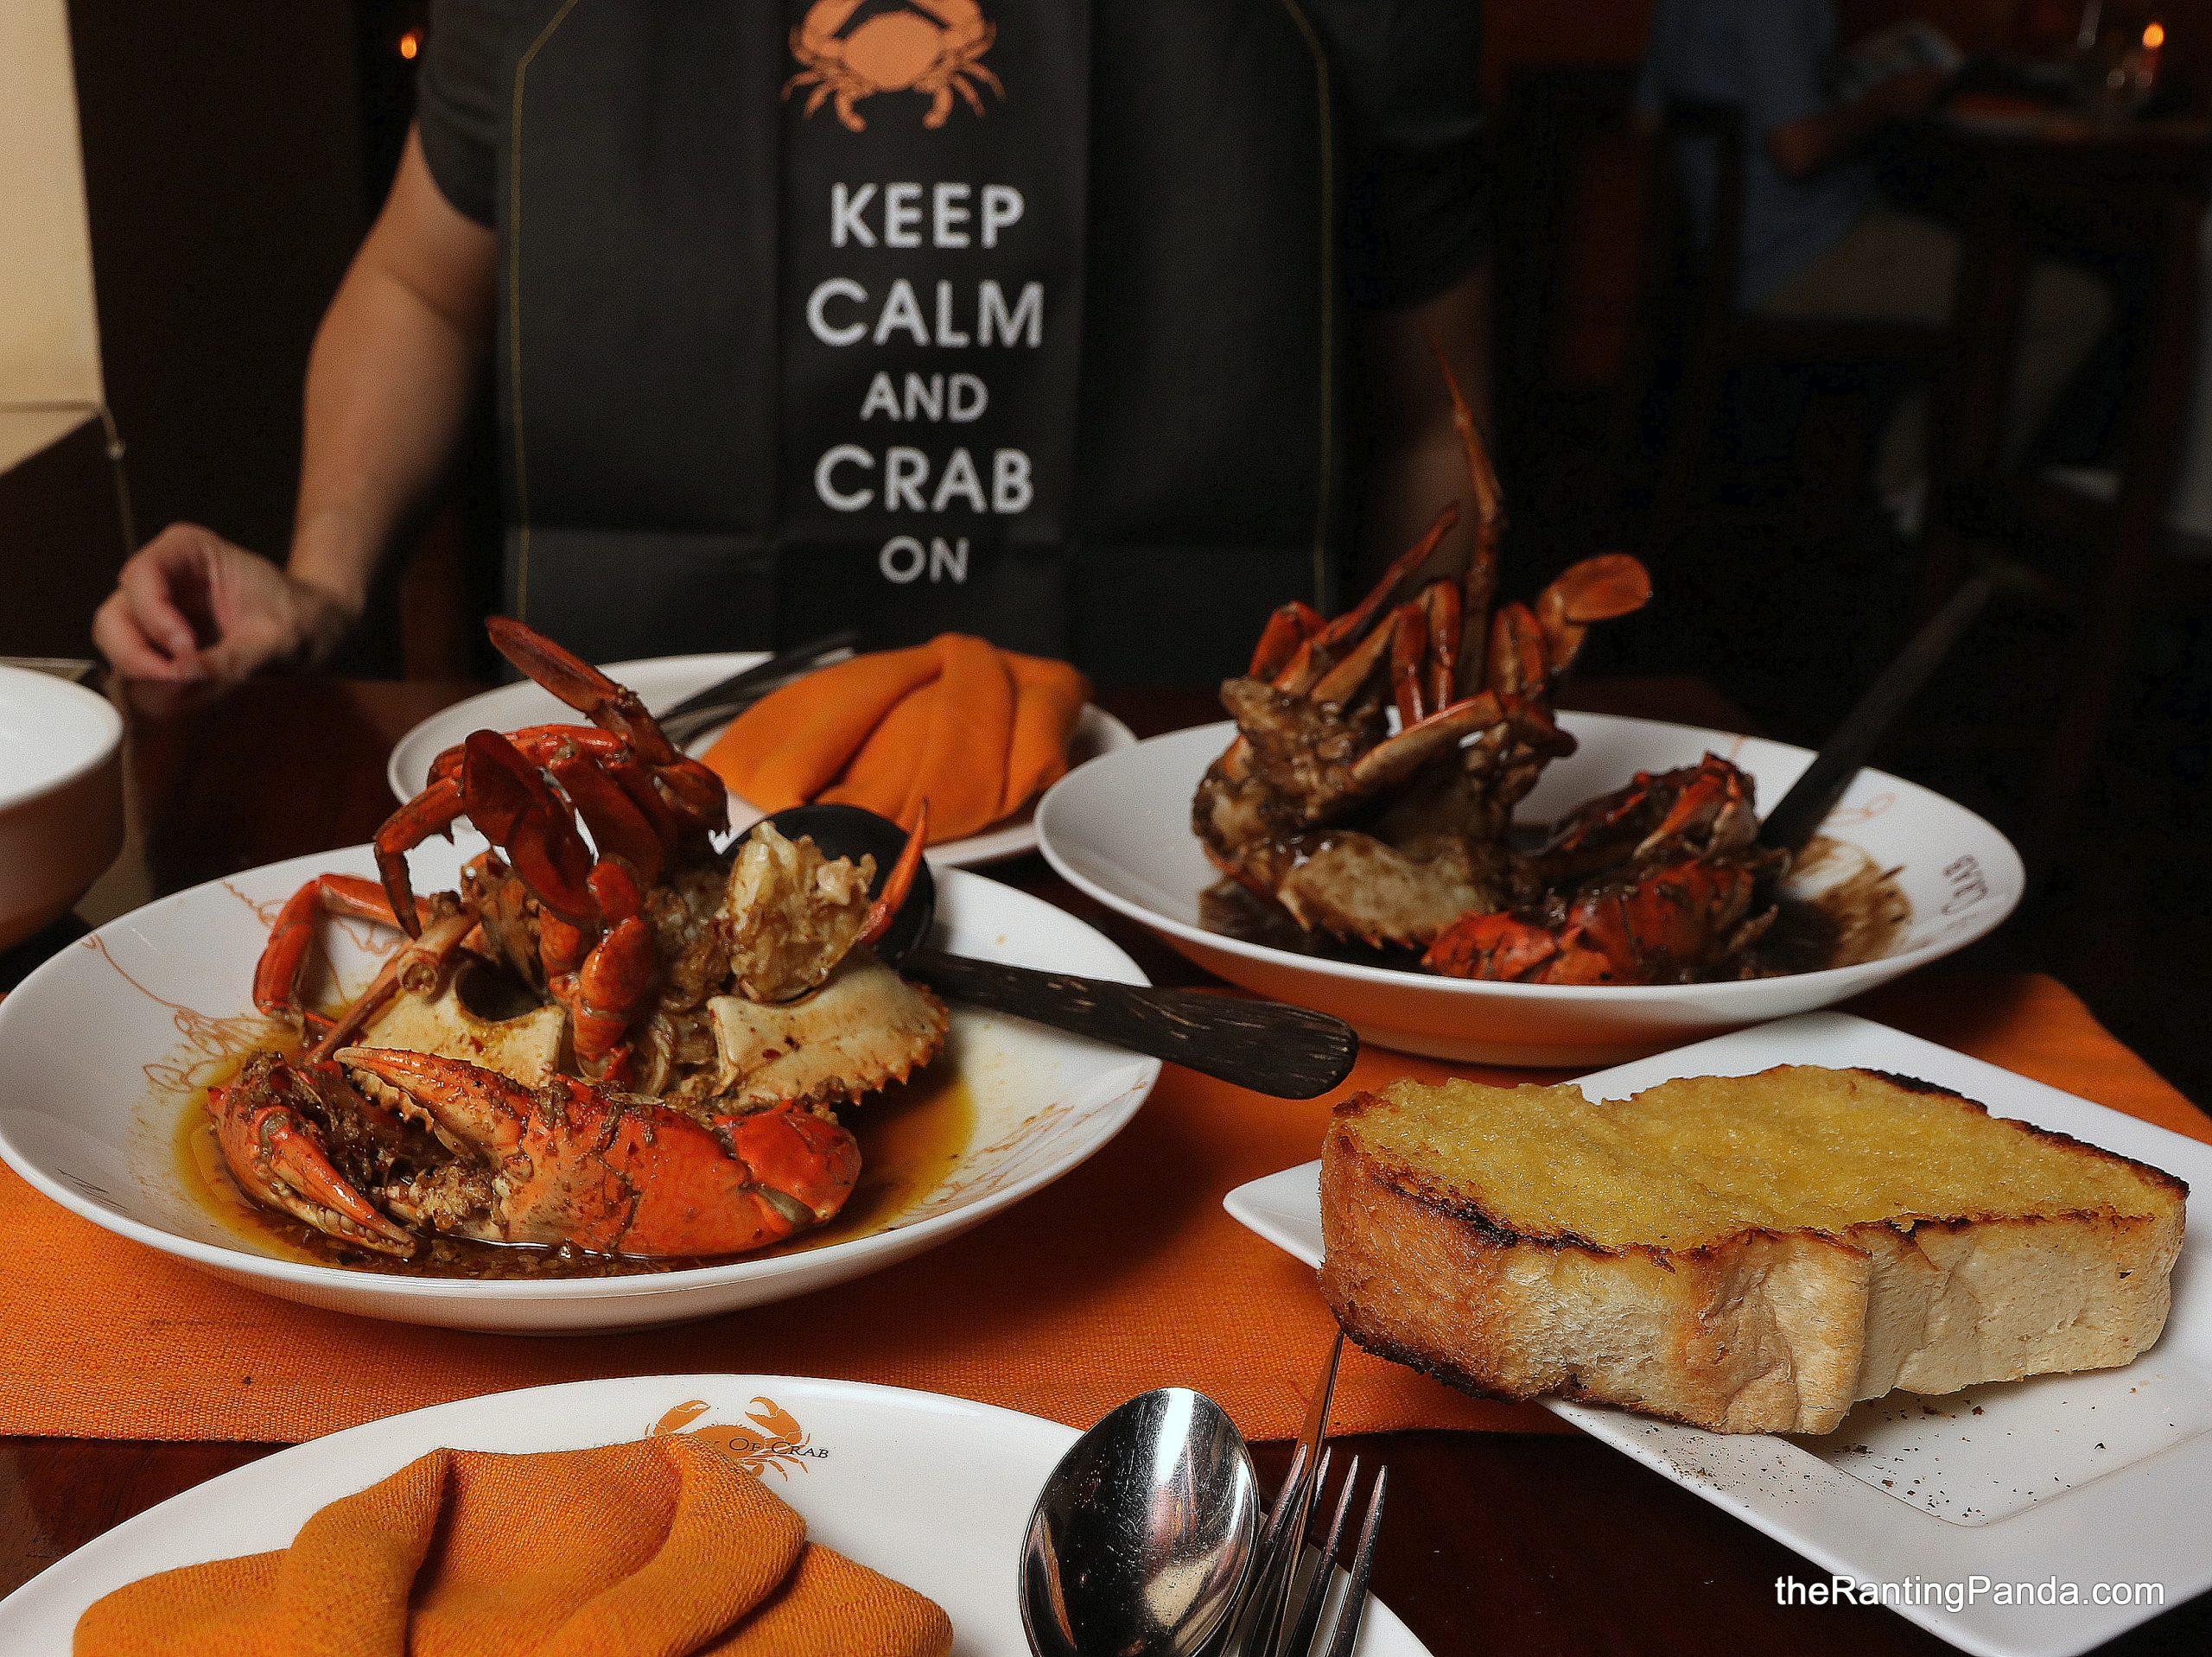 Ministry of Crab Amazing Restaurant in Sri Lanka